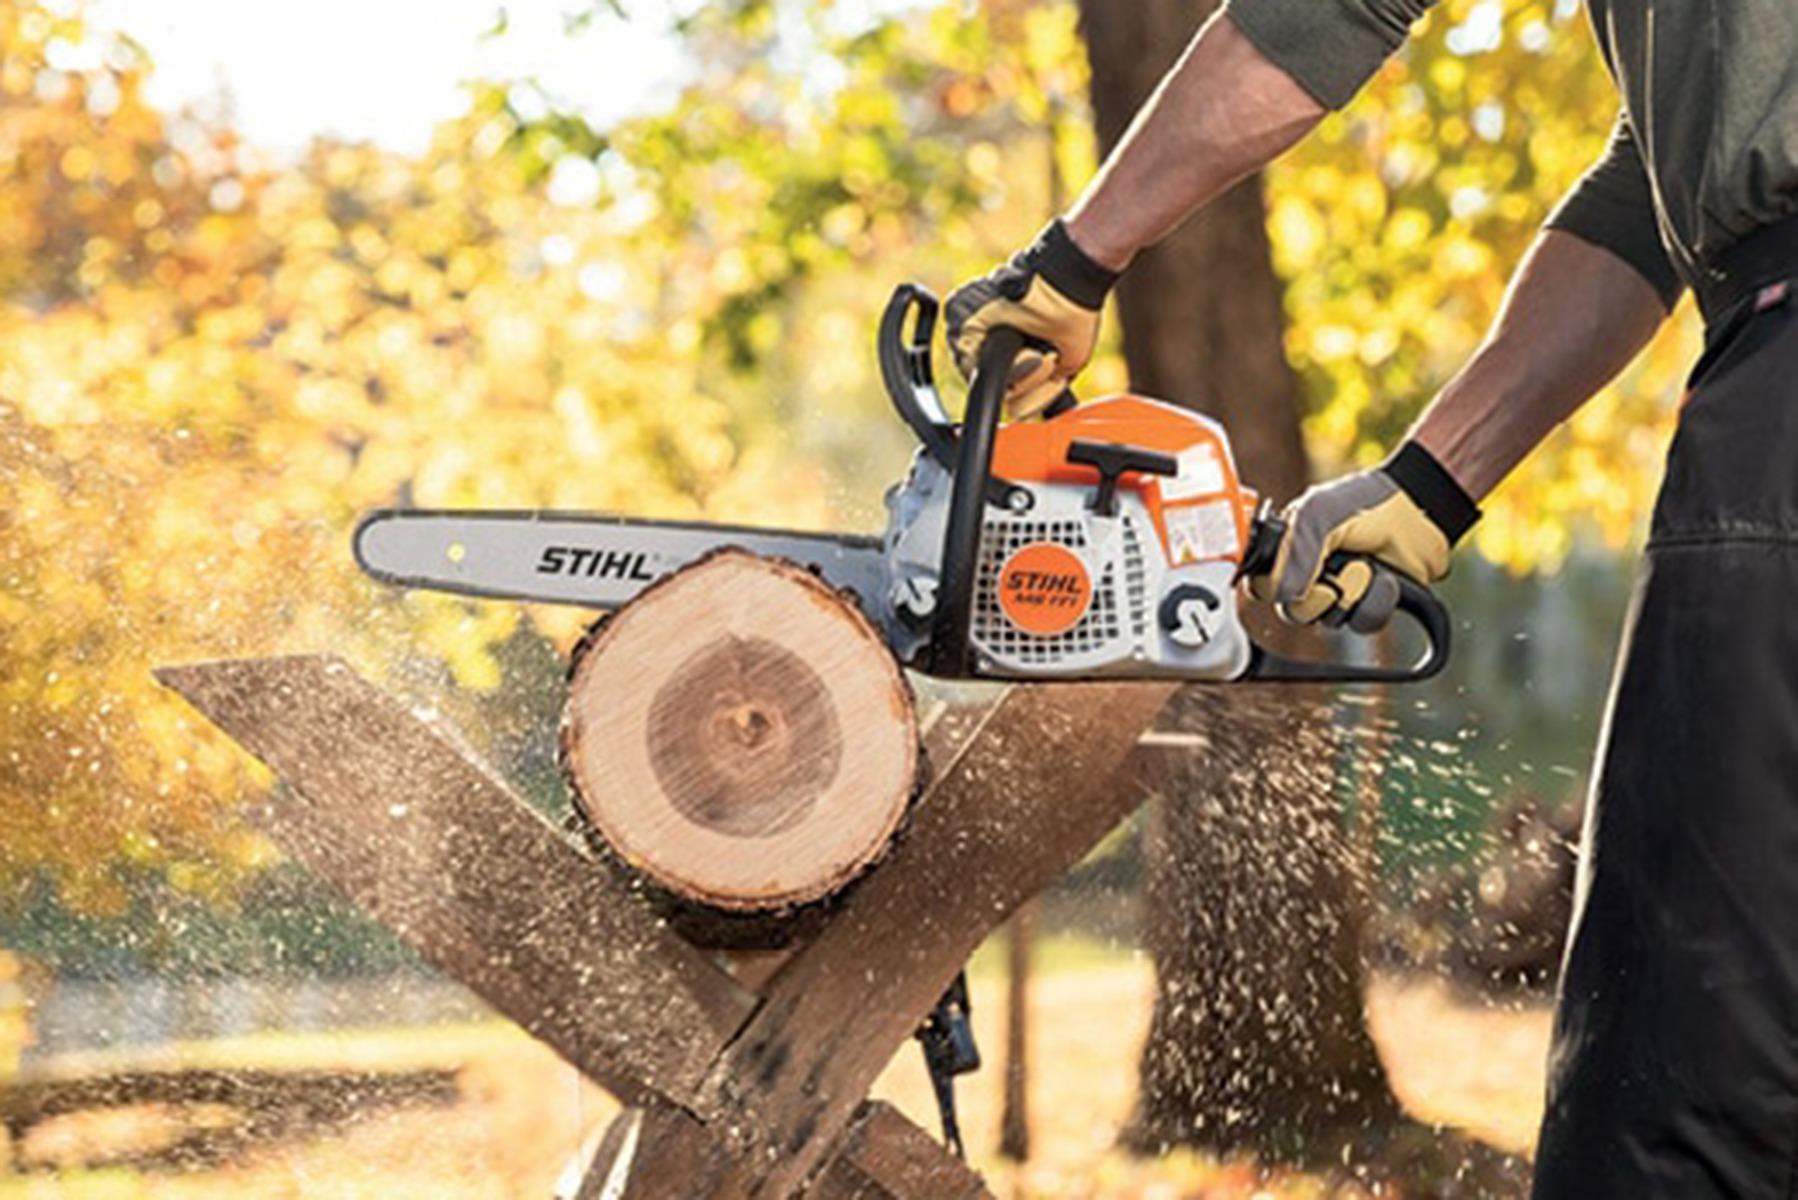 A man holding a Petrol Chainsaw cutting through a log on a sawhorse